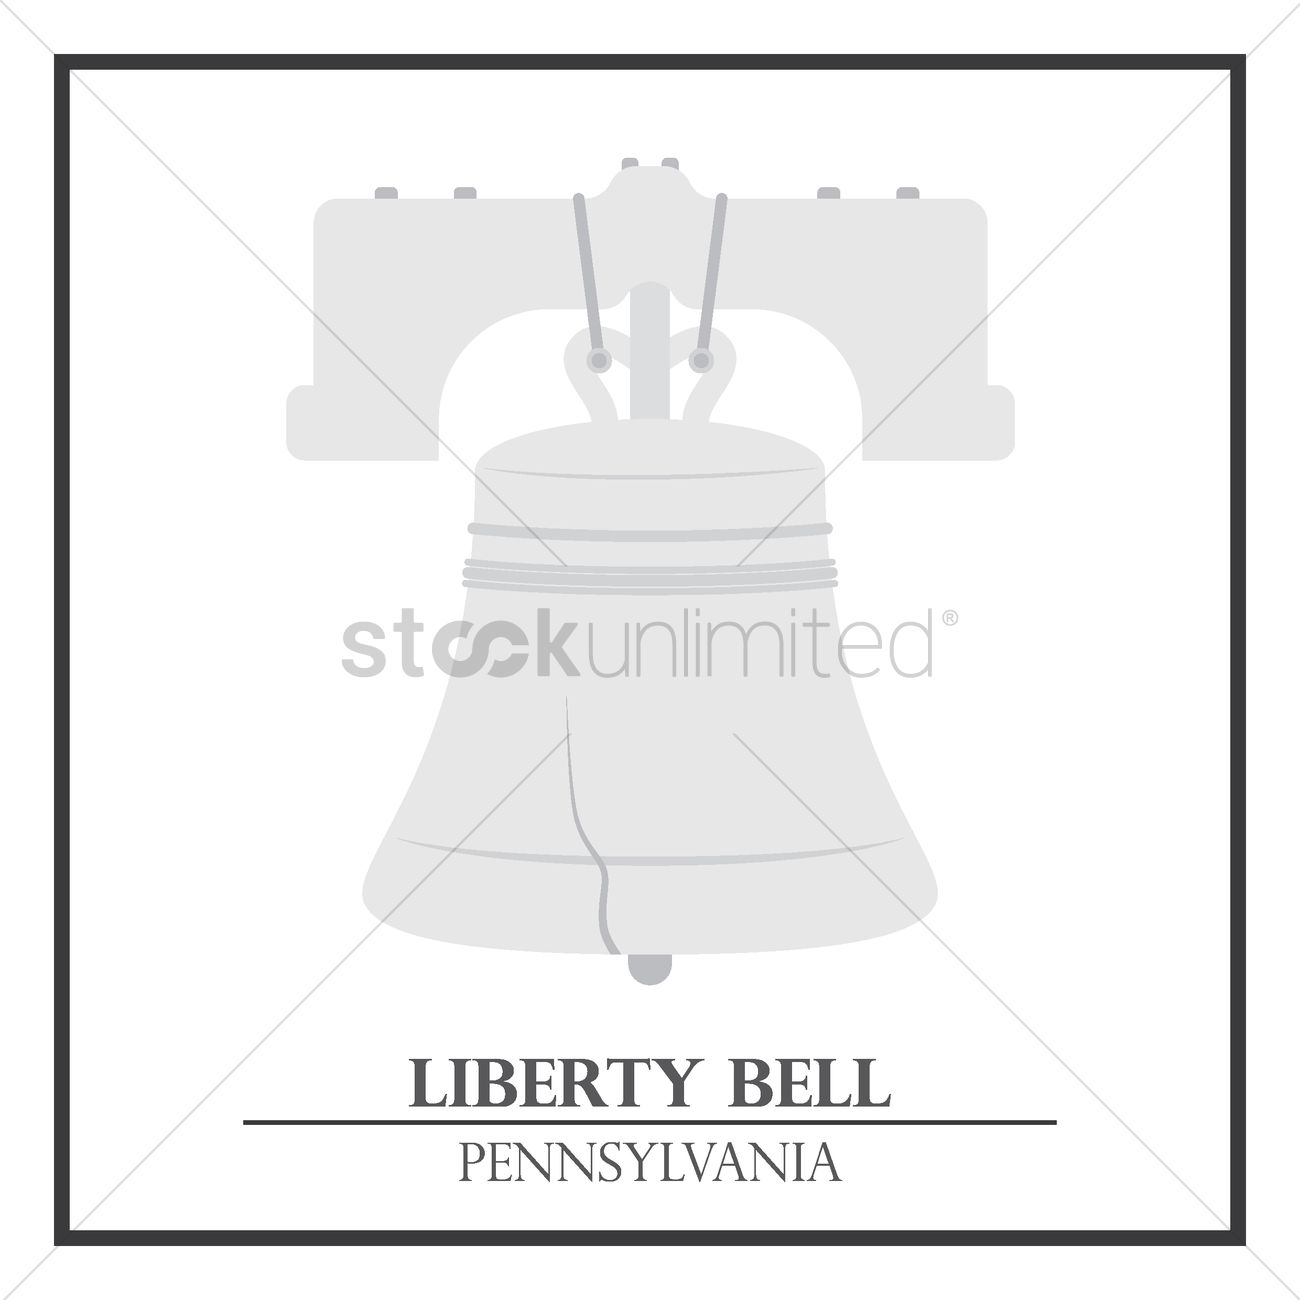 1300x1300 Liberty Bell Vector Image